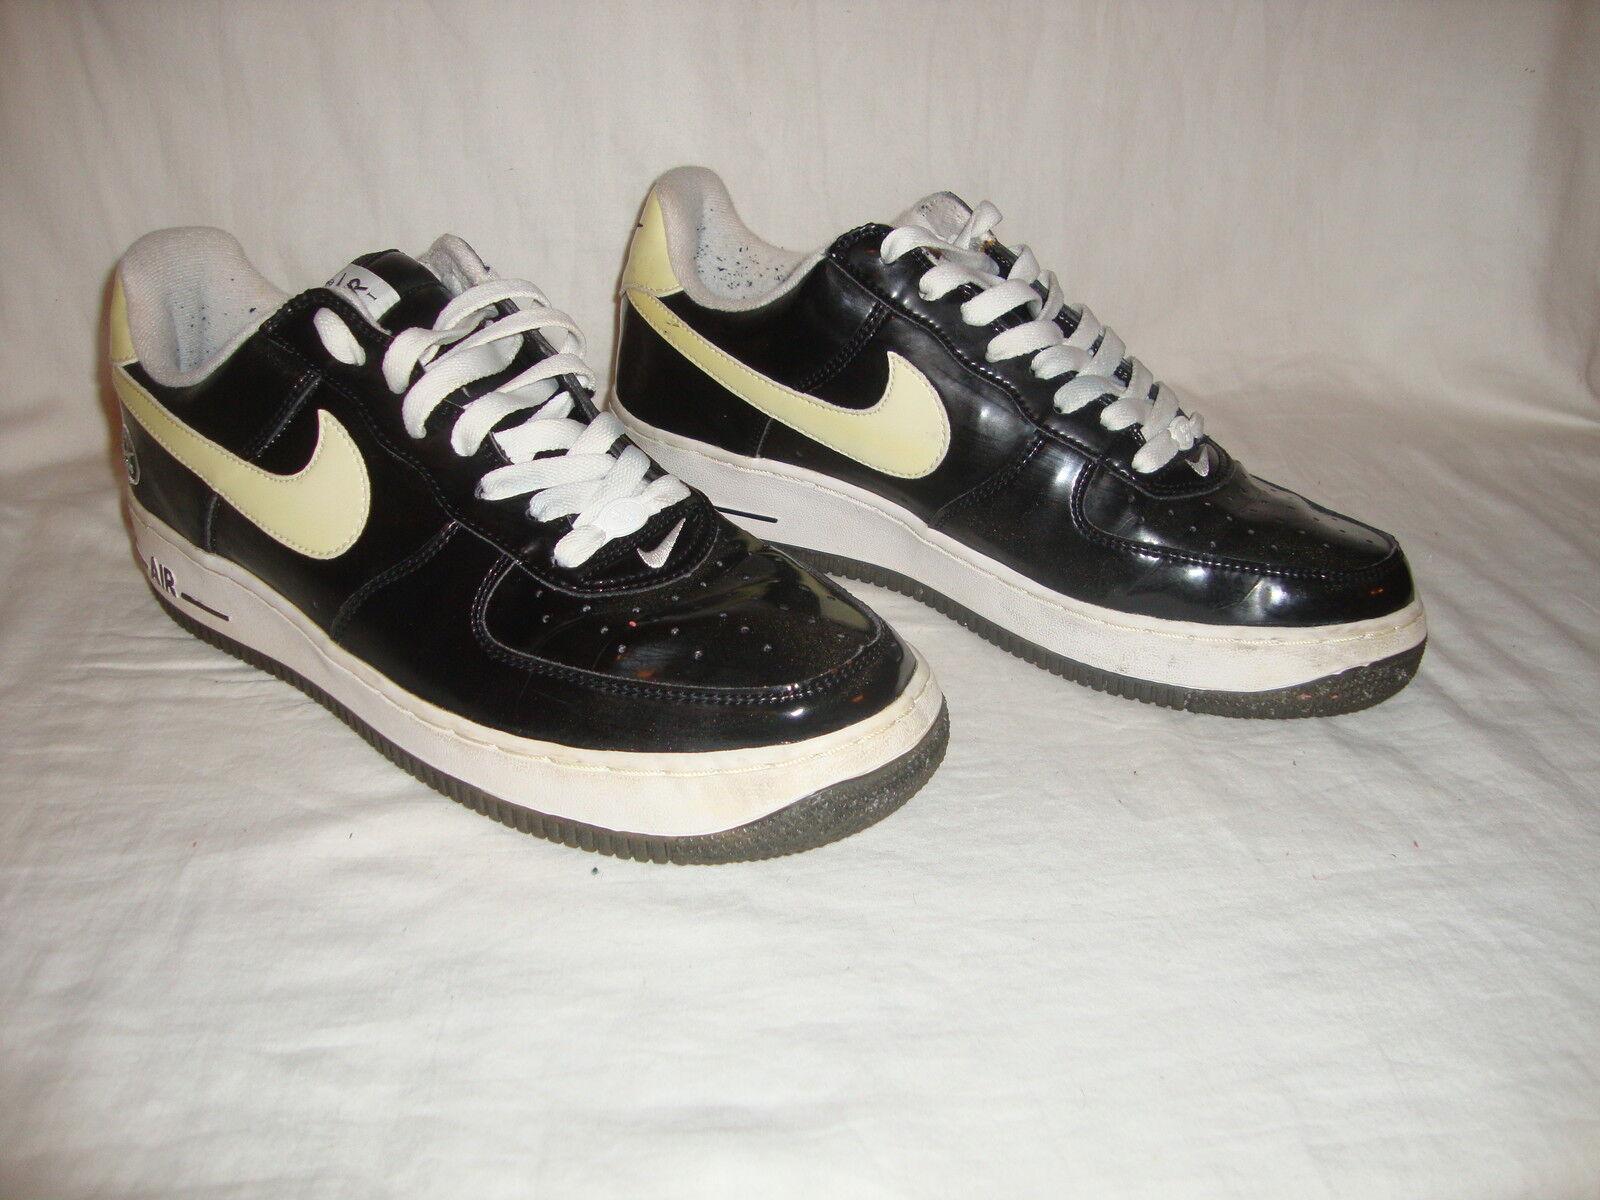 2005 Men's Nike 306509 Air Force 1 Low Matrix Euro Import Size 9.5 Black & White